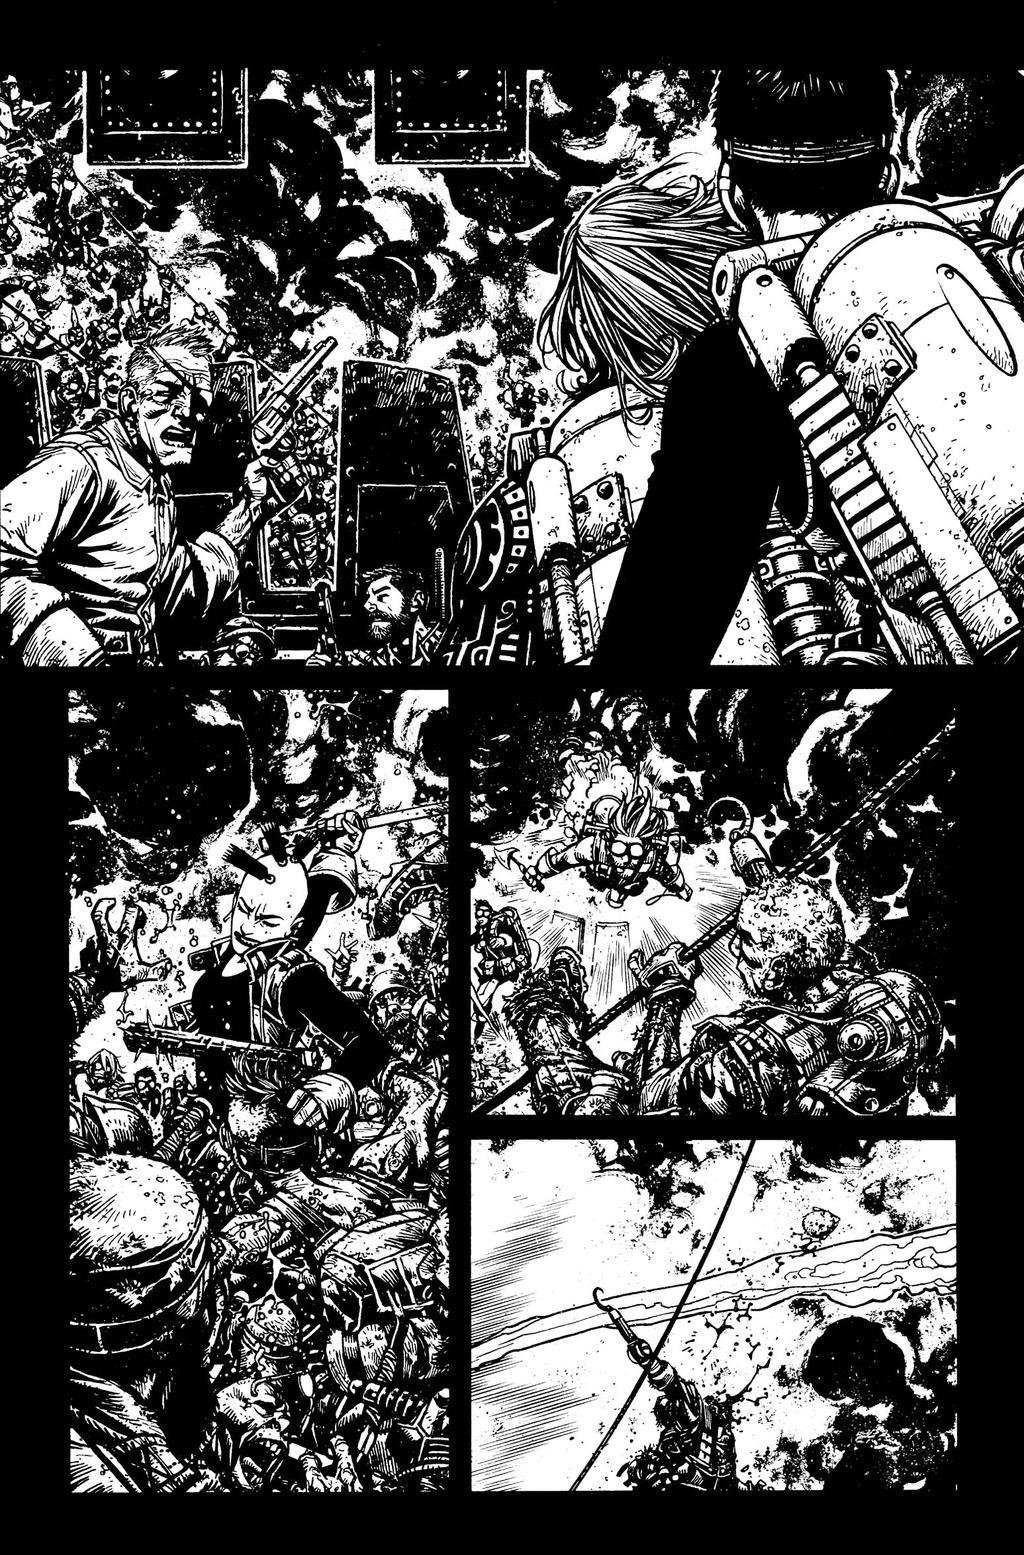 Wild Blue Yonder Issue 3 Page 20 by Spacefriend-KRUNK